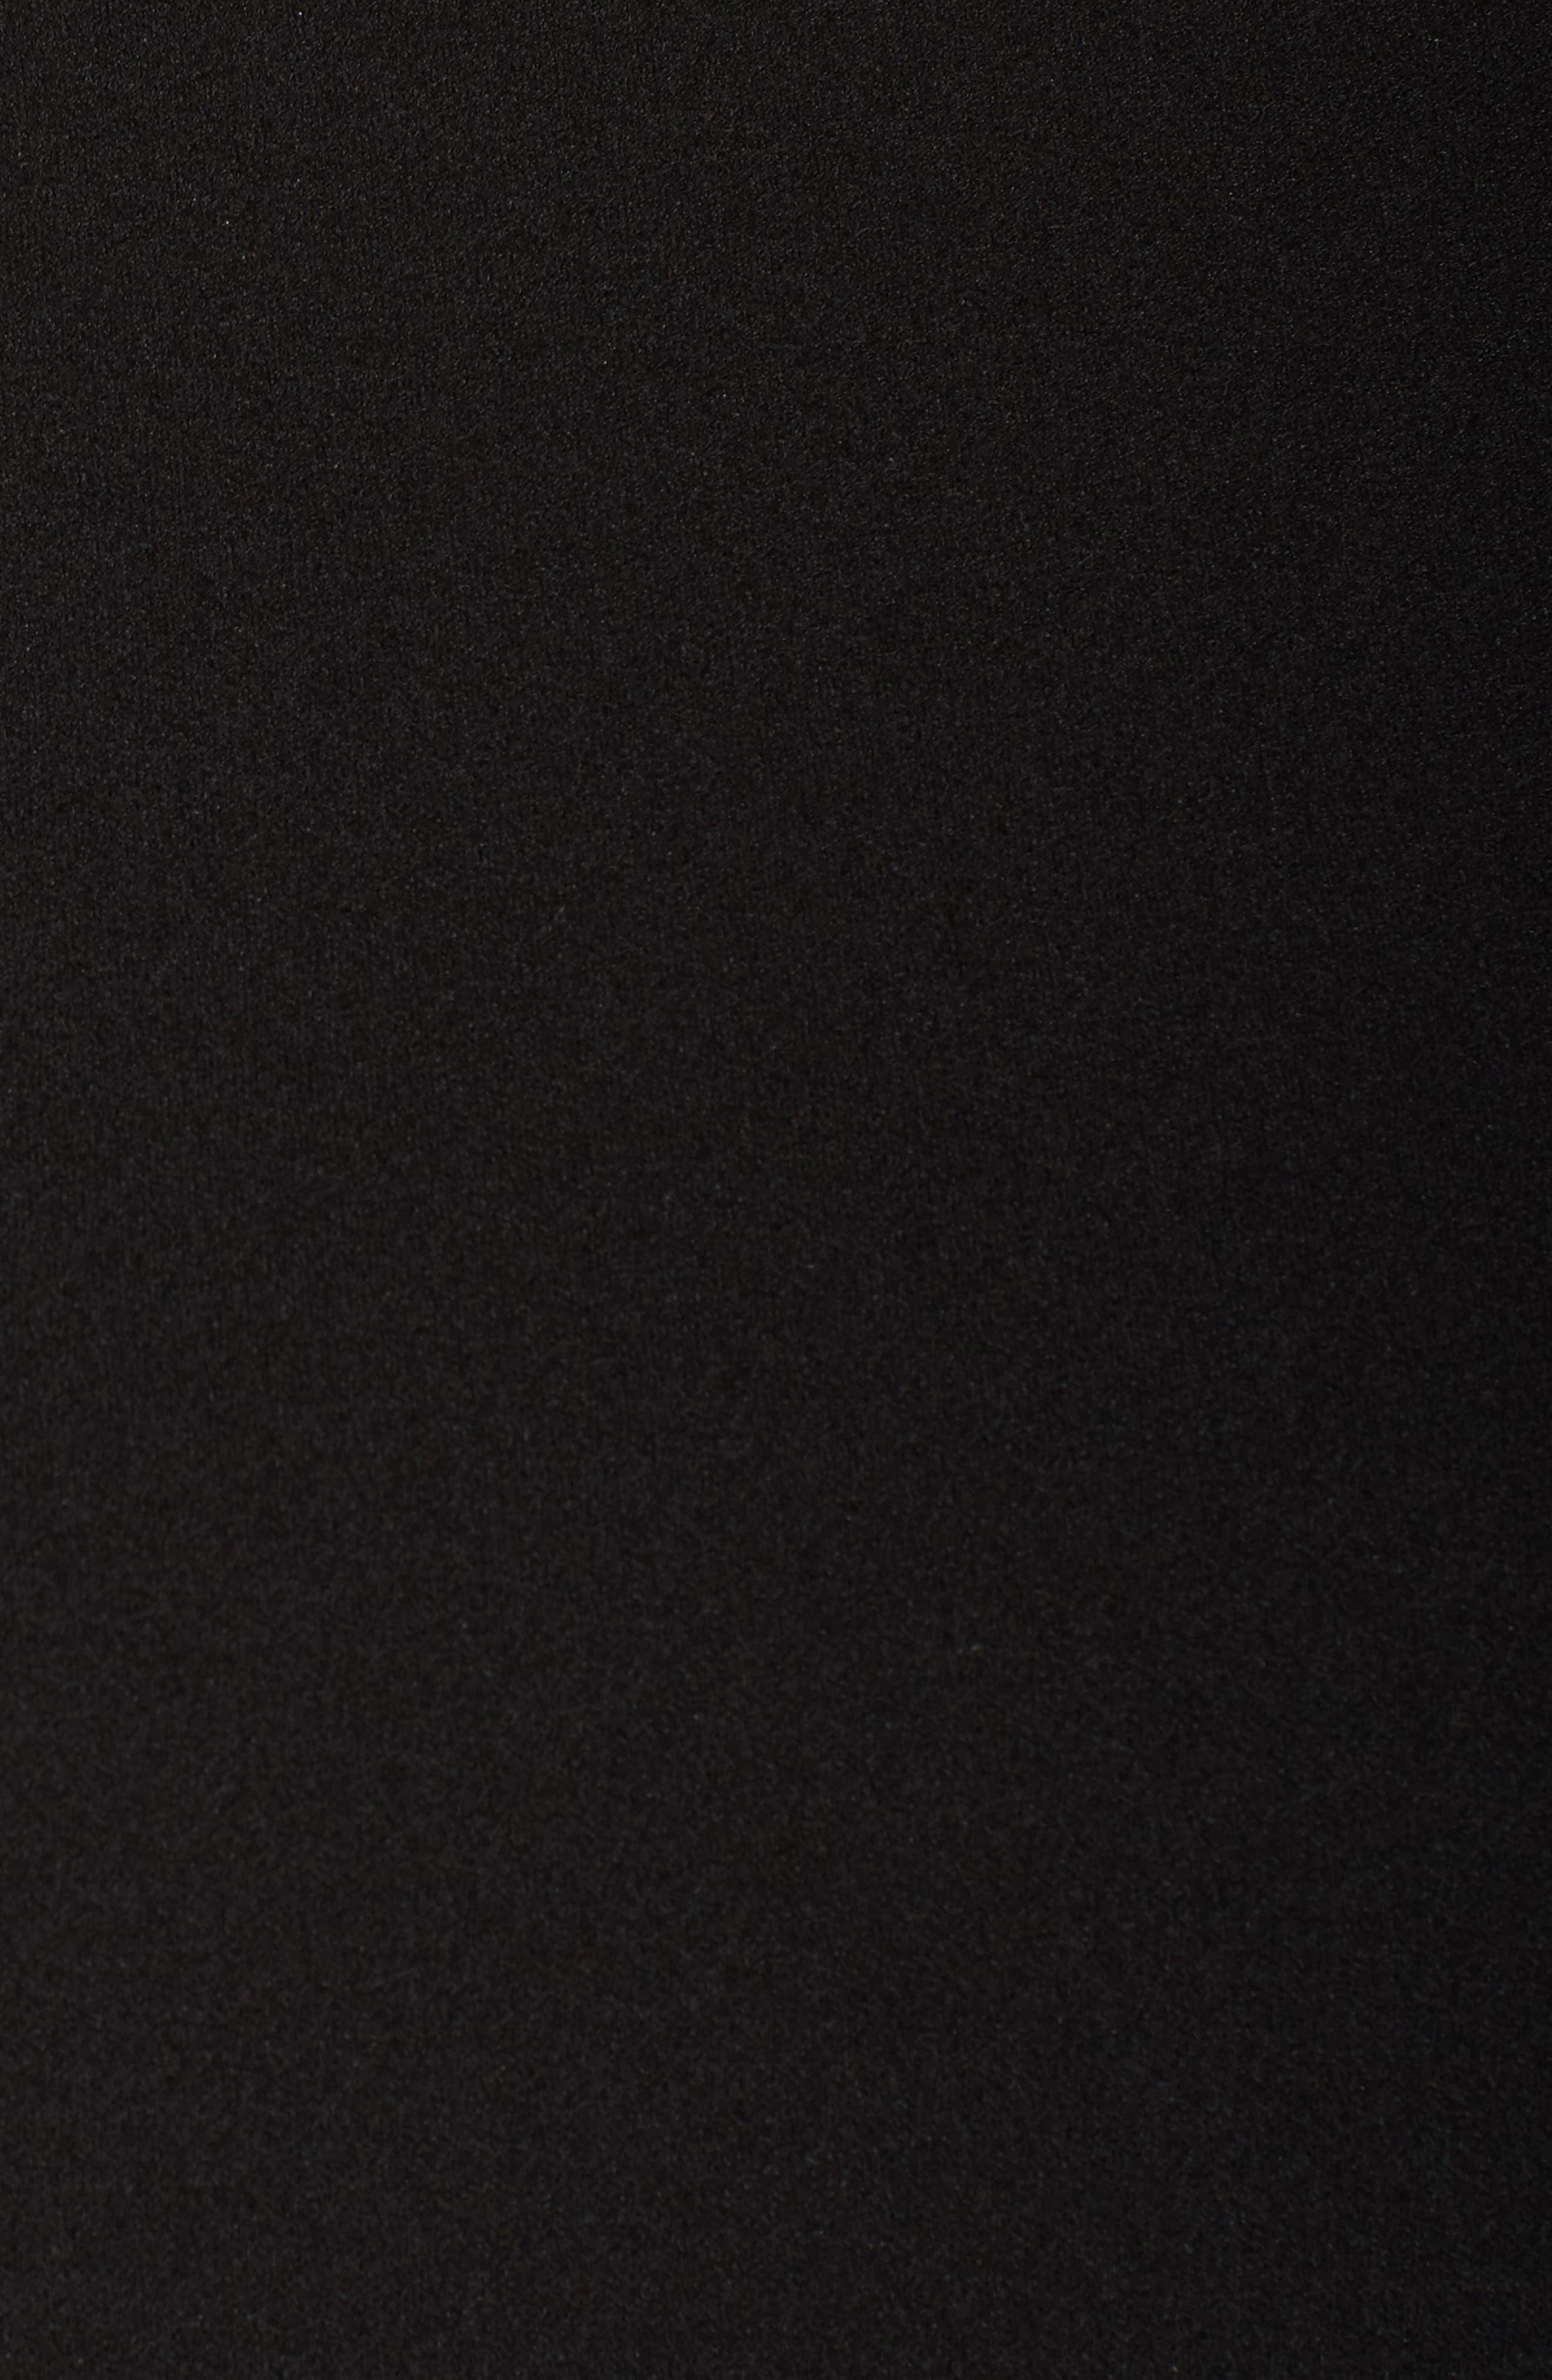 Mock Neck Fit & Flare Dress,                             Alternate thumbnail 5, color,                             Black